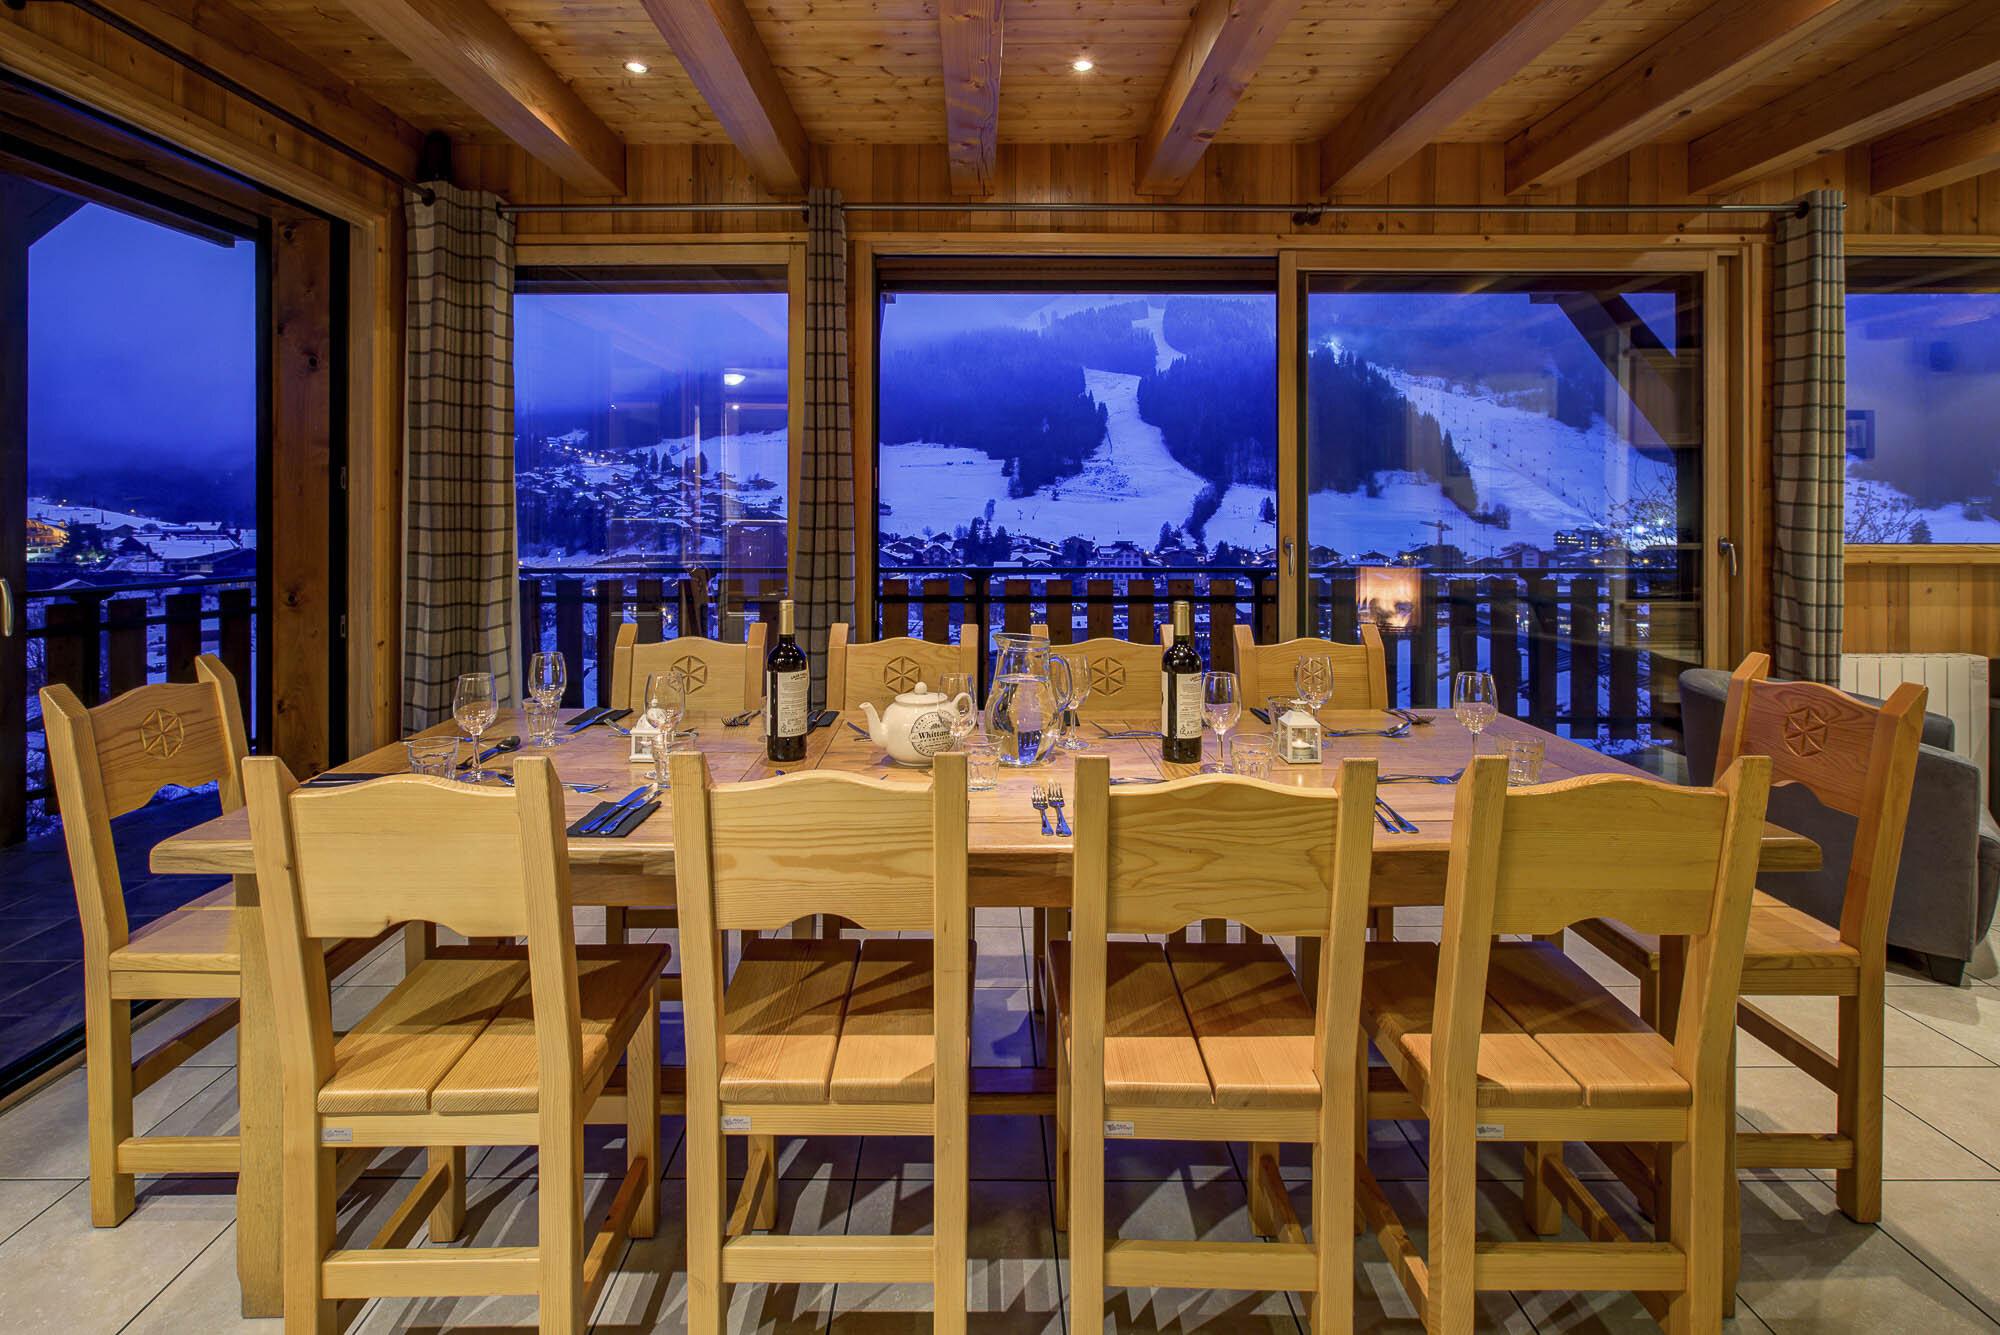 tg-ski-chalet-le-roc-soleil-morzine-018.jpg